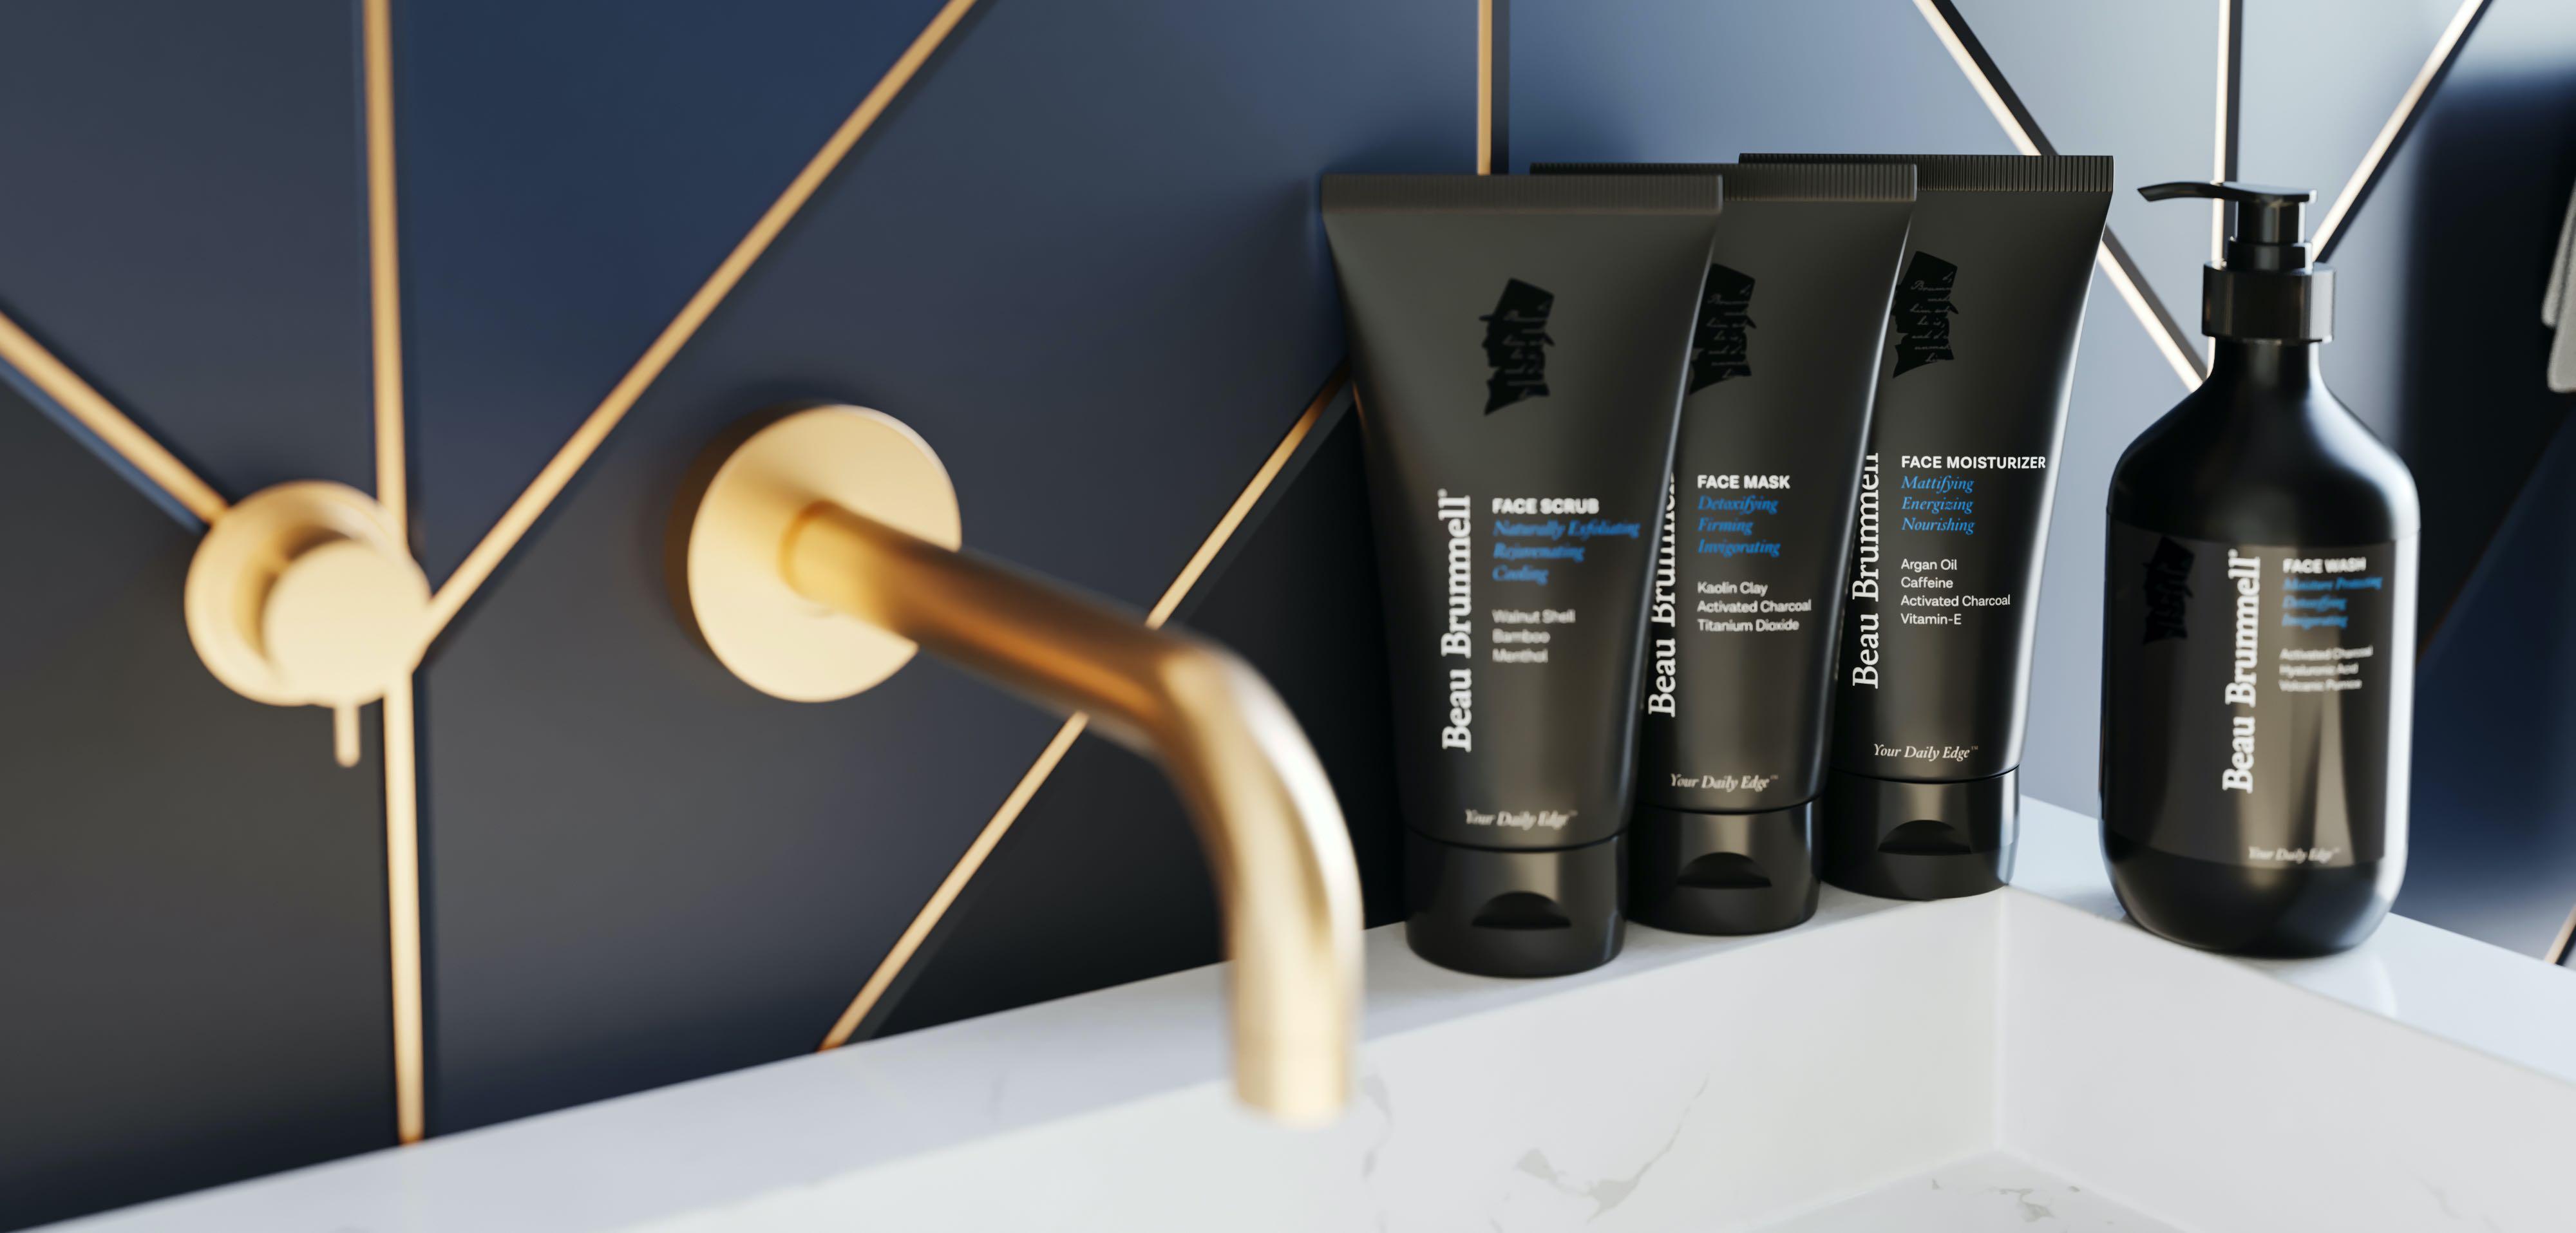 Beau Brummell Skincare Pro Bundle